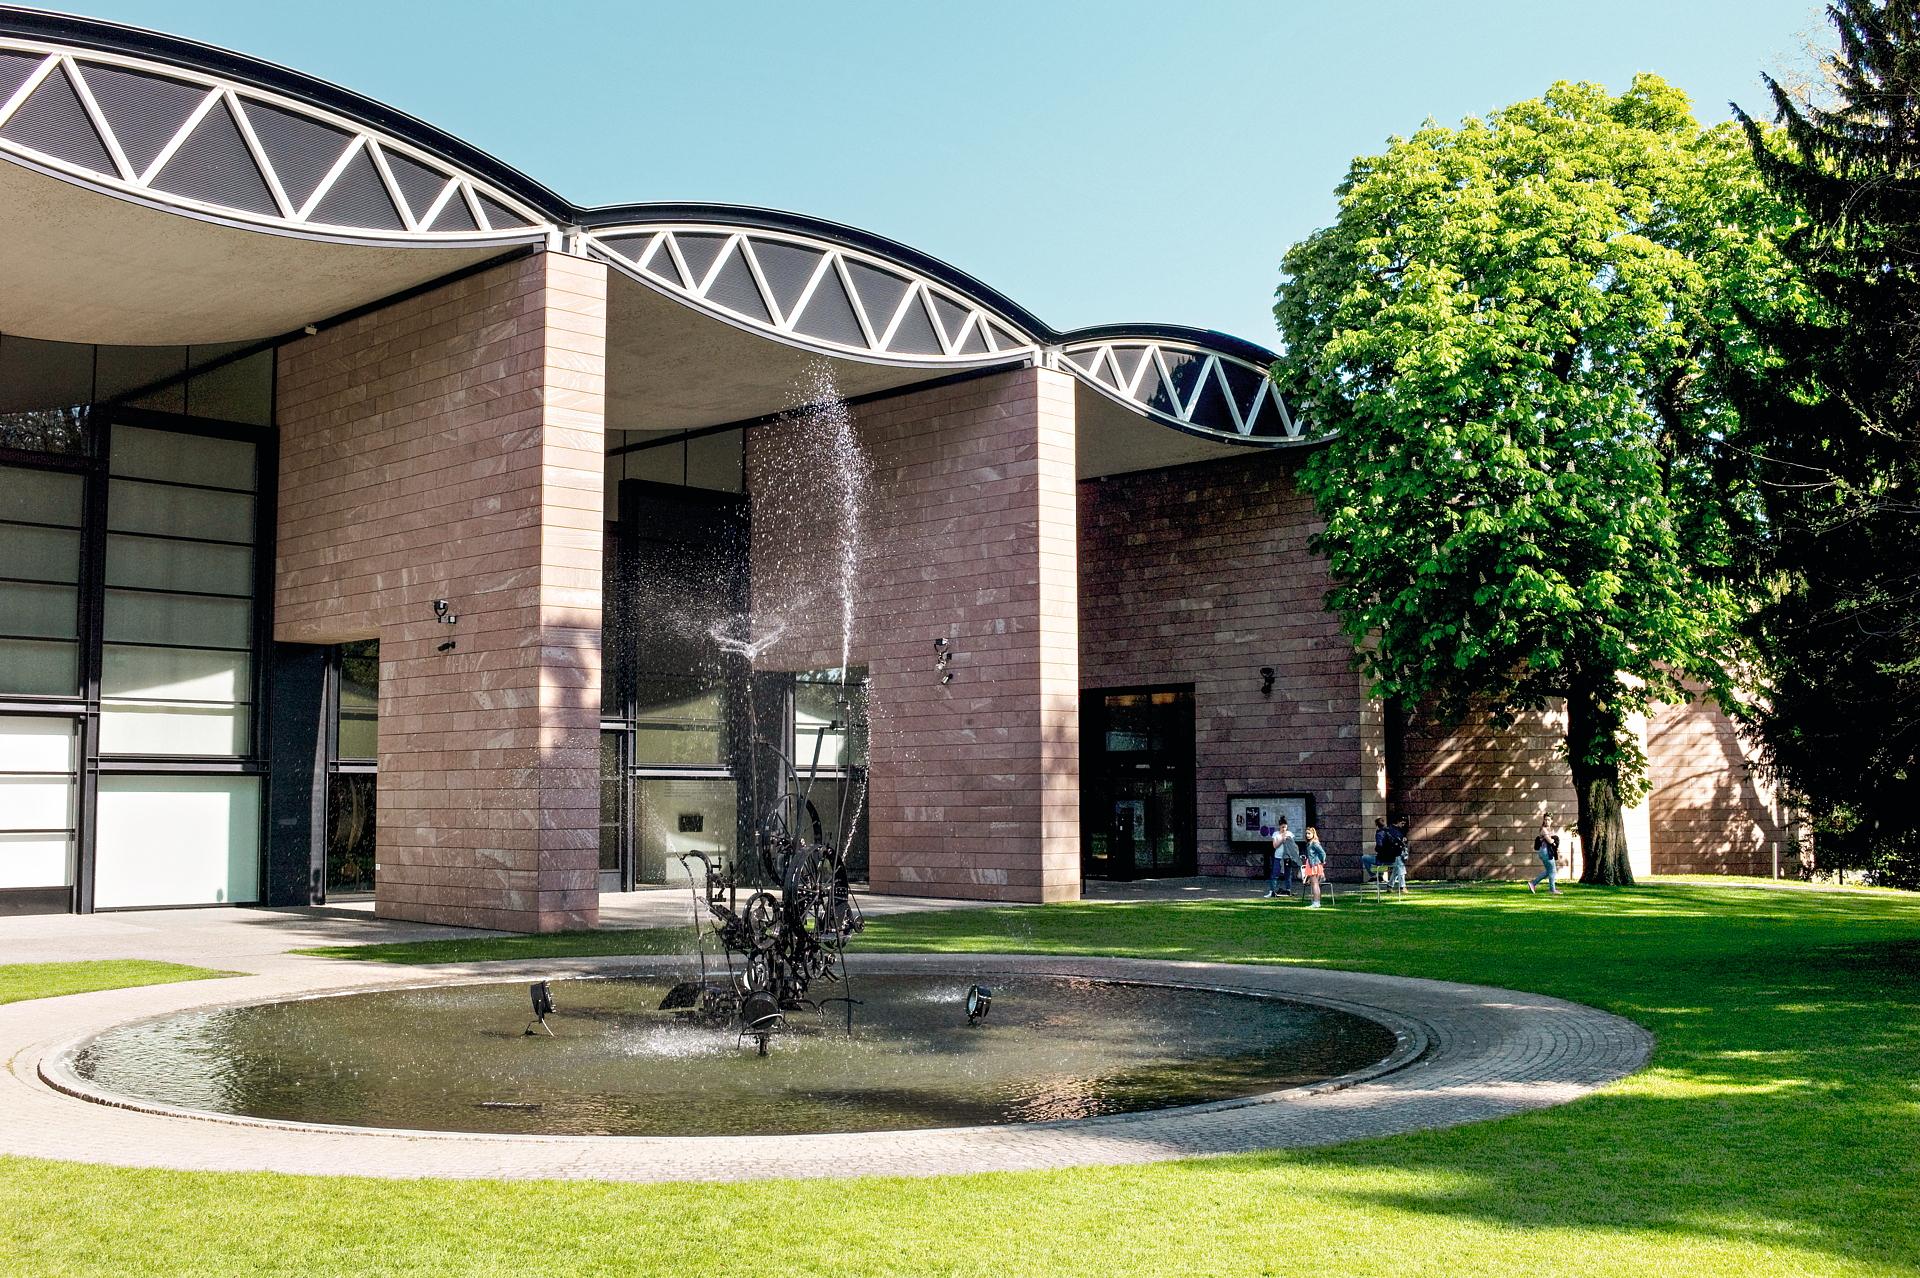 Basilea: architettura e design contemporanei innovativi